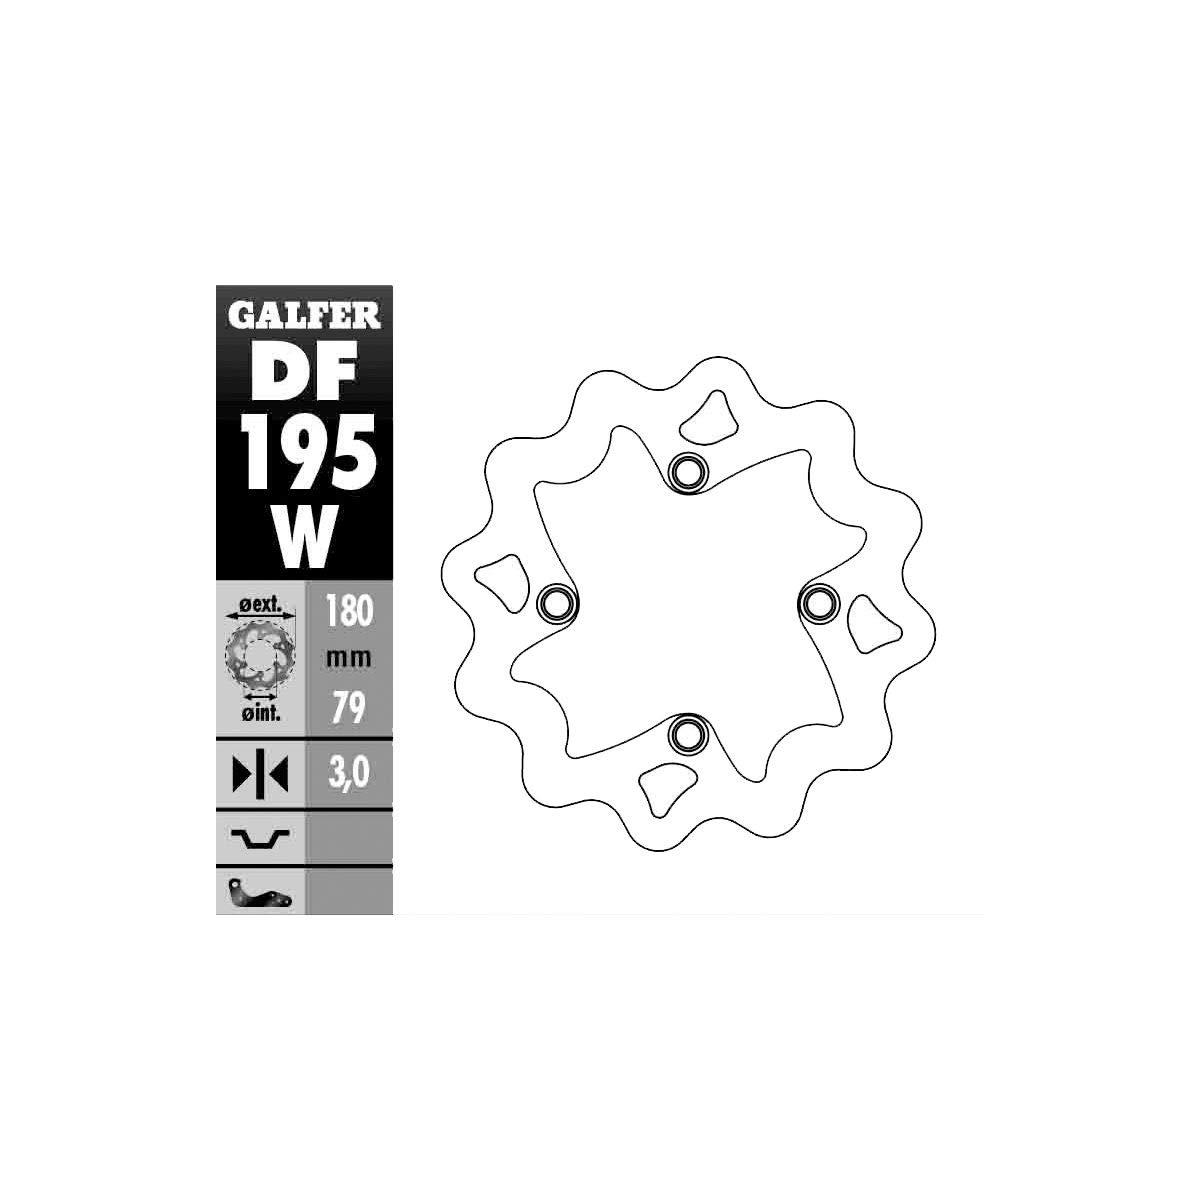 00-19 KAWASAKI KX65: Galfer Standard Wave Brake Rotor - Rear DF195W